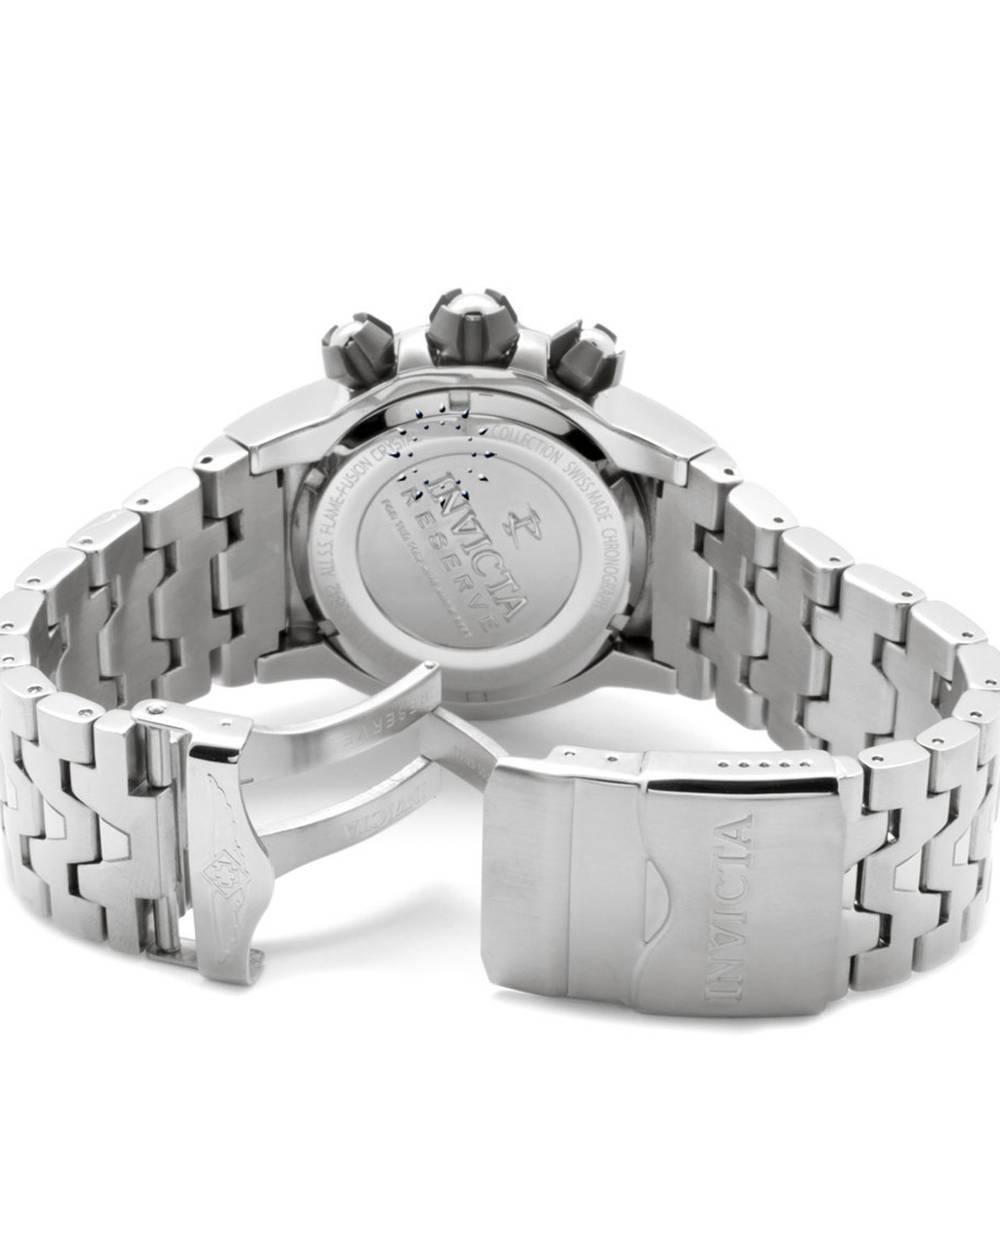 invicta excursion chrono stainless steel bracelet